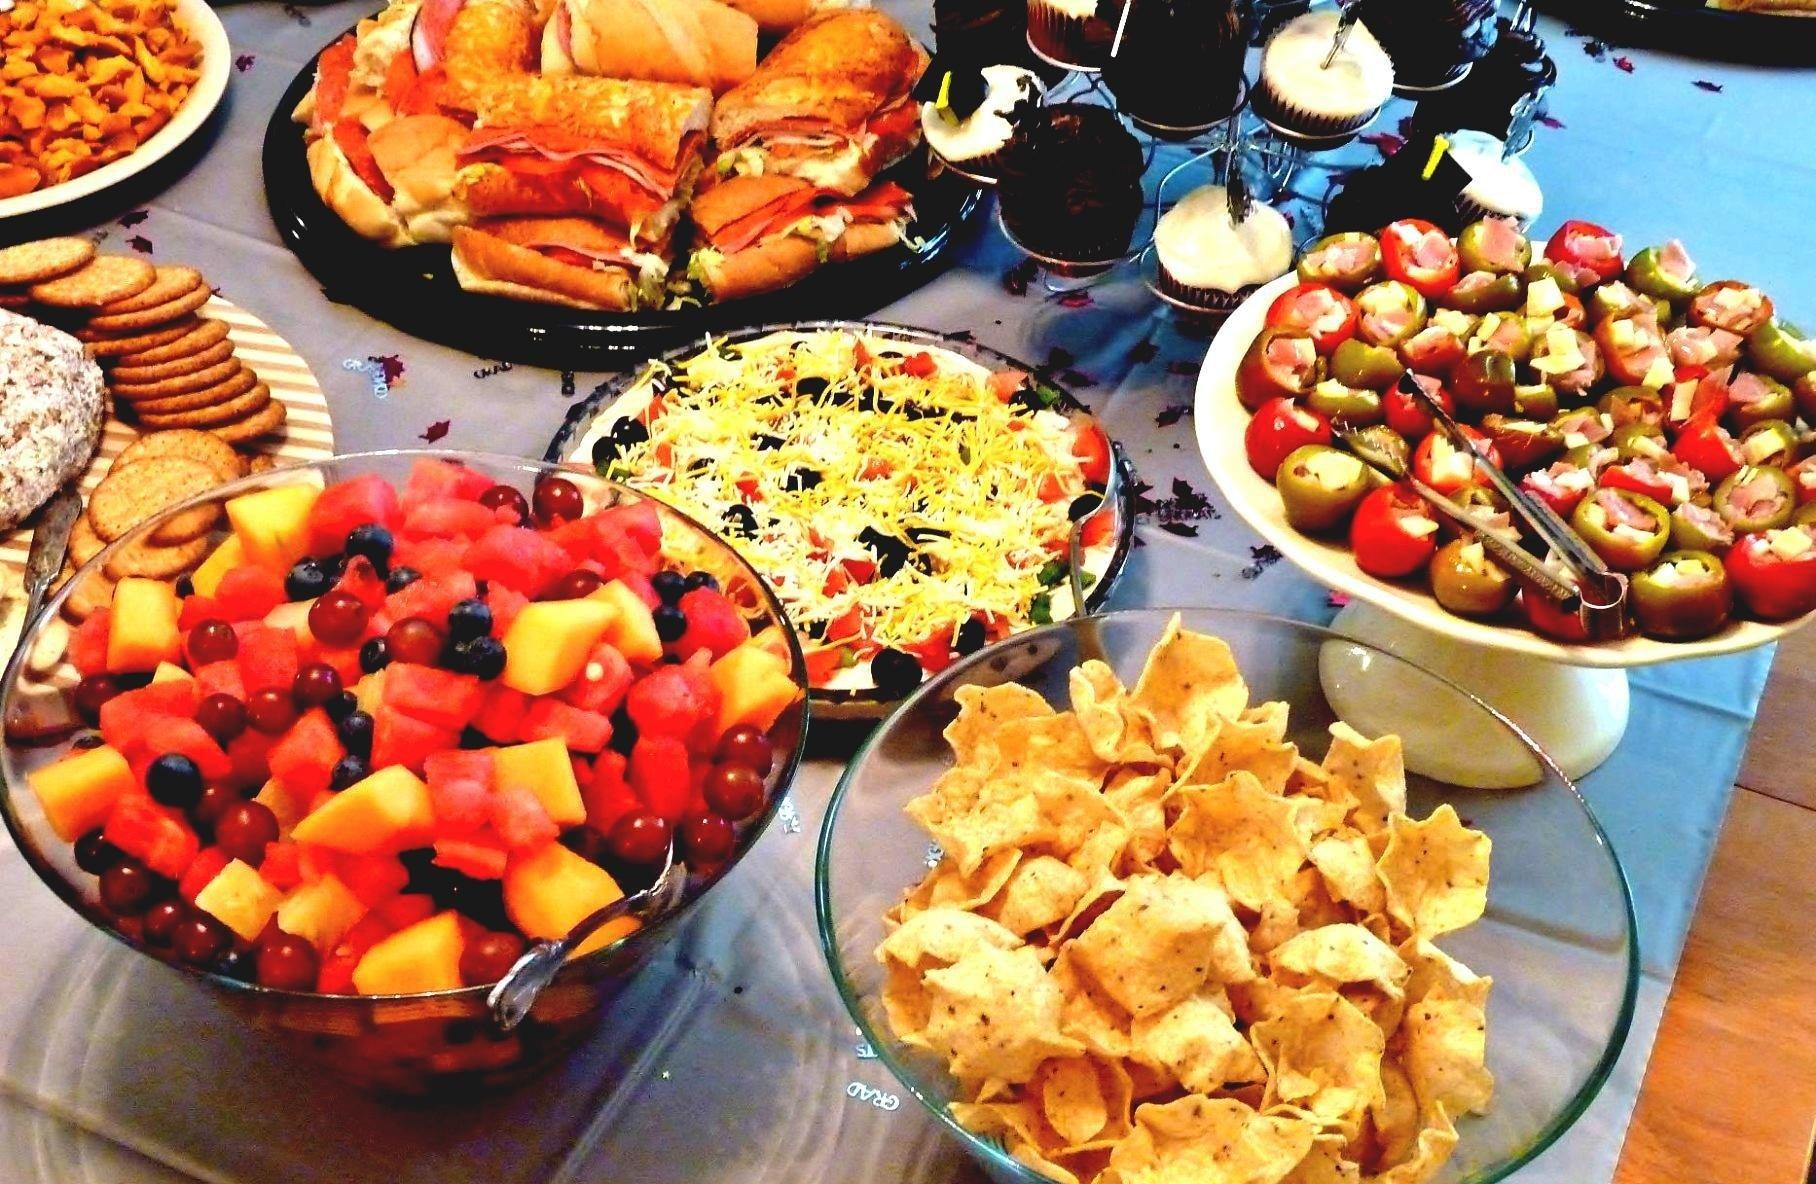 10 Elegant Ideas For Graduation Party Food glancing mary berry goats cheese shallot tart recipe graduation 2021